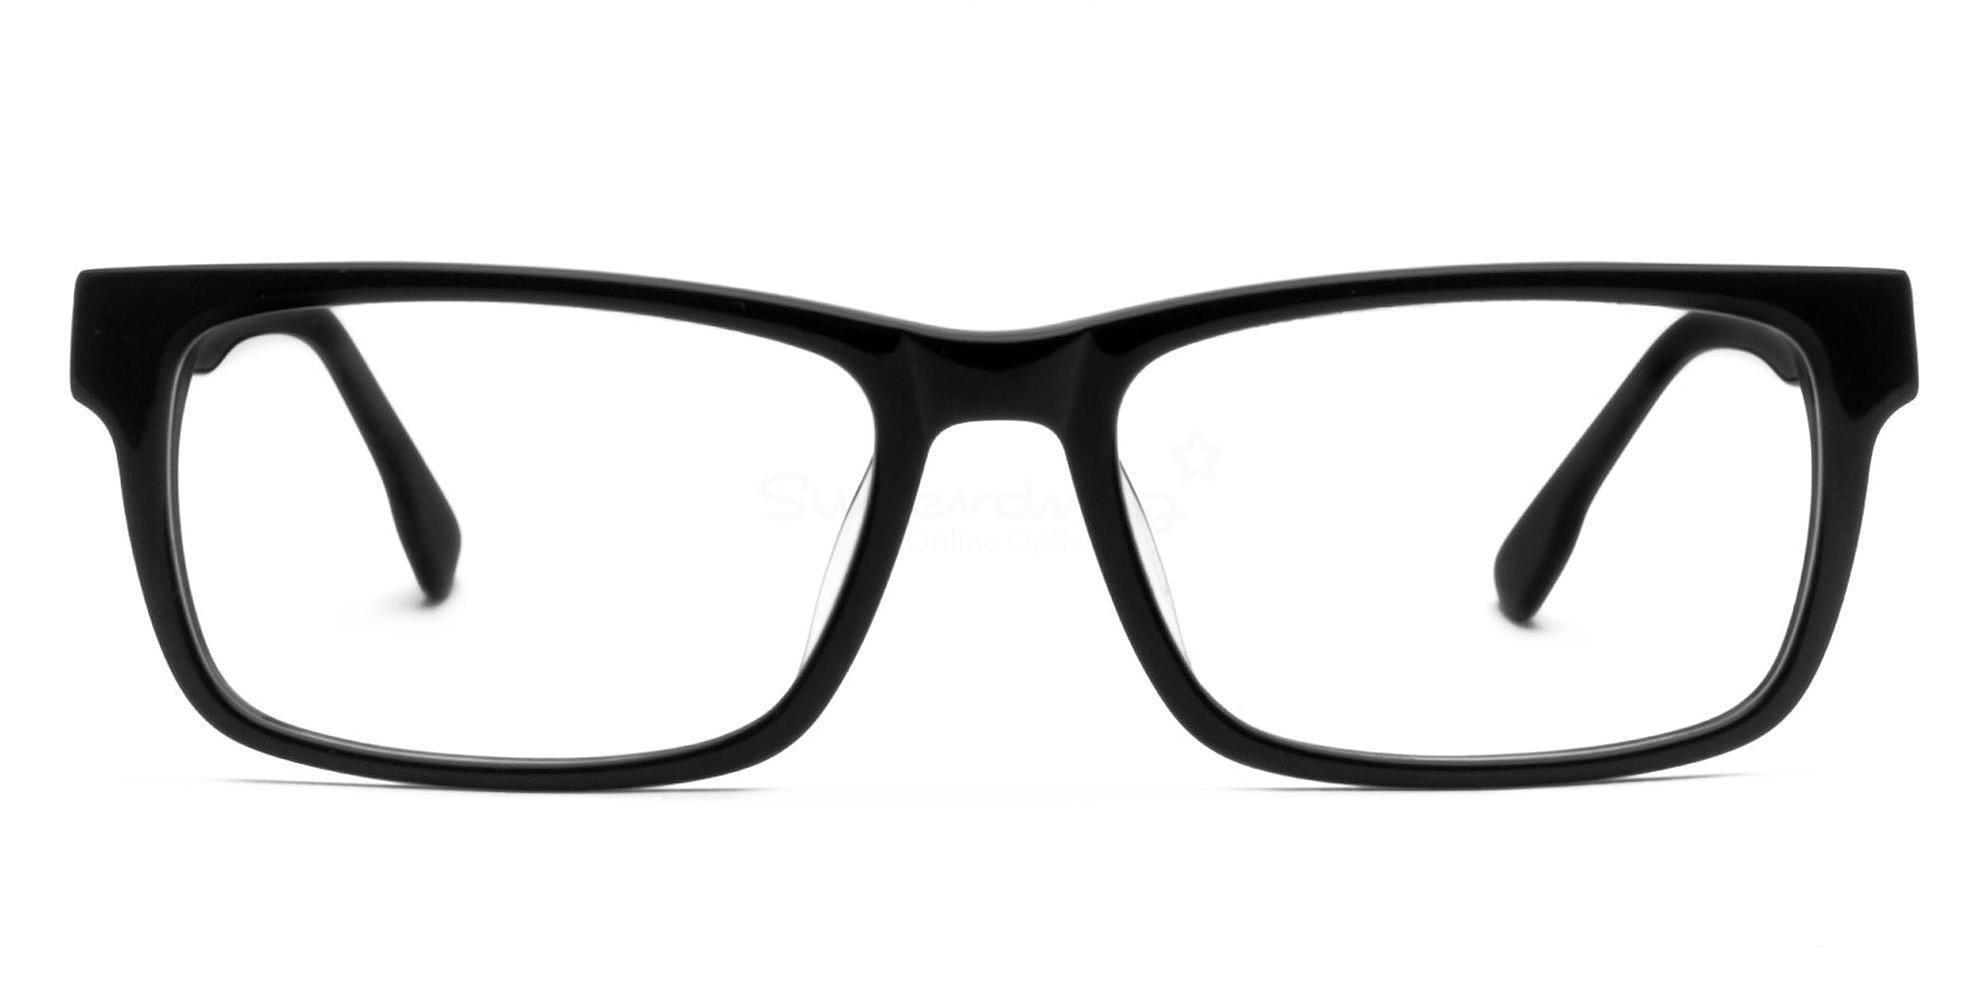 C07 HY81057 Glasses, Immense